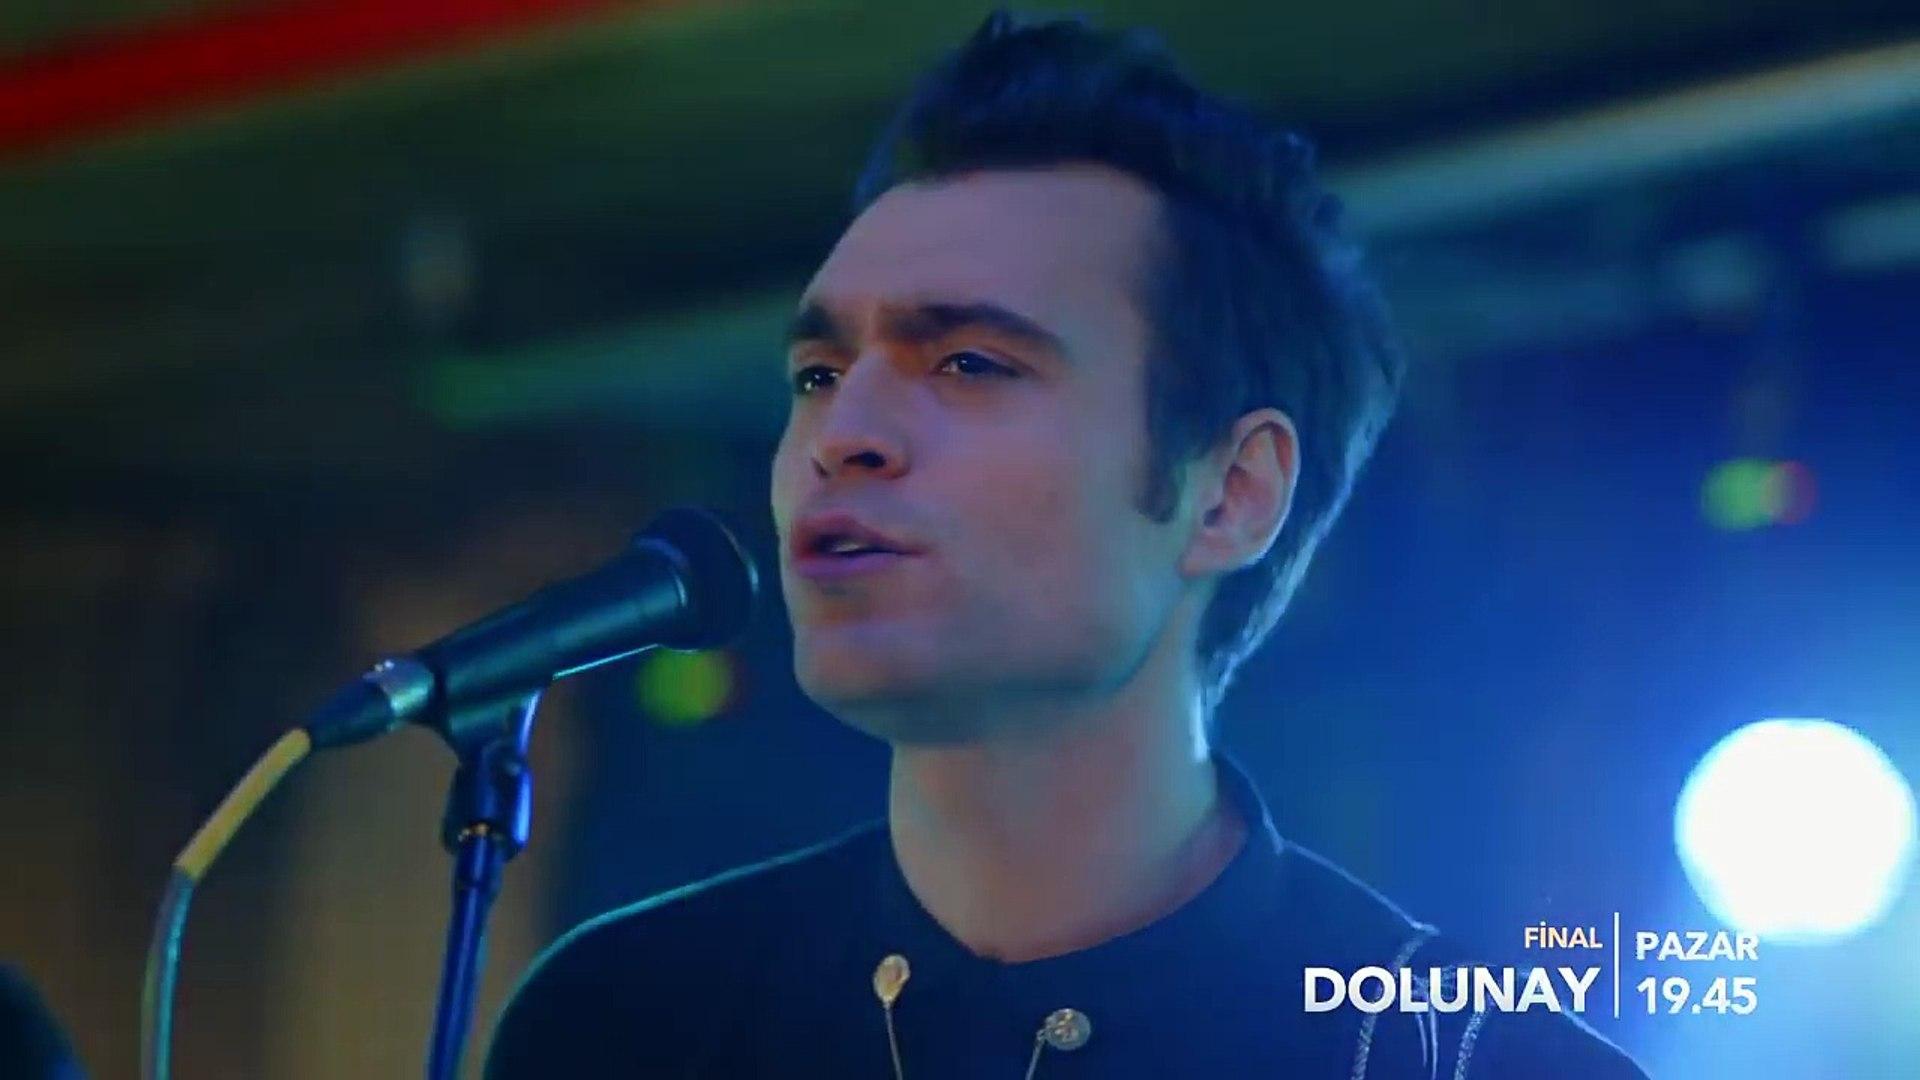 Dolunay / Full Moon Trailer - Episode 26 - FINAL - (Eng & Tur Subs)